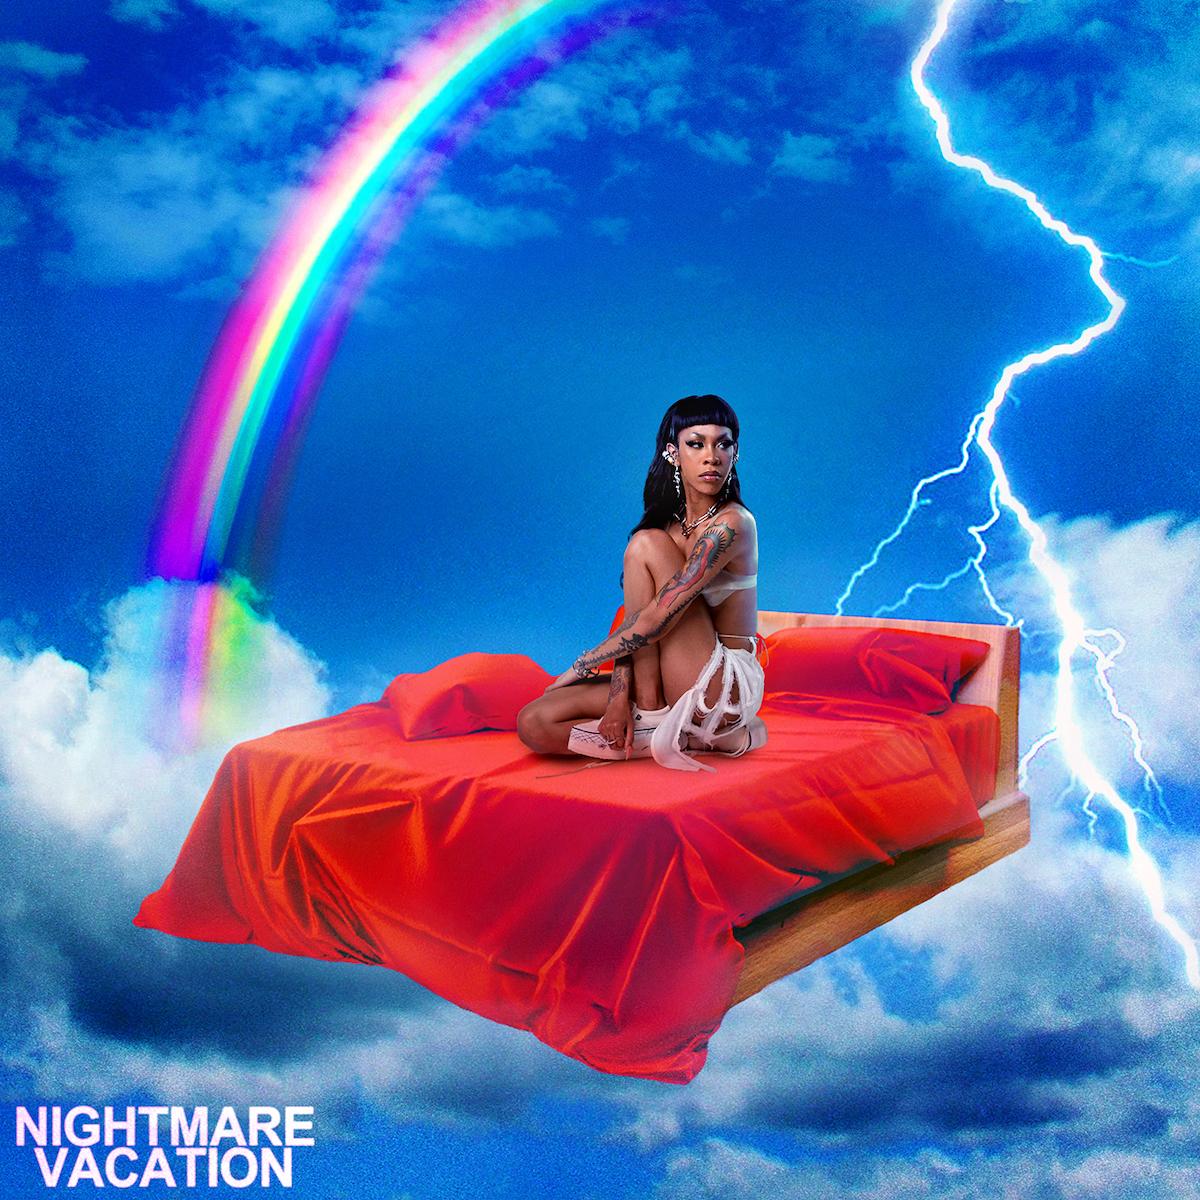 Rico Nasty - Nightmare Vacation | Album Review